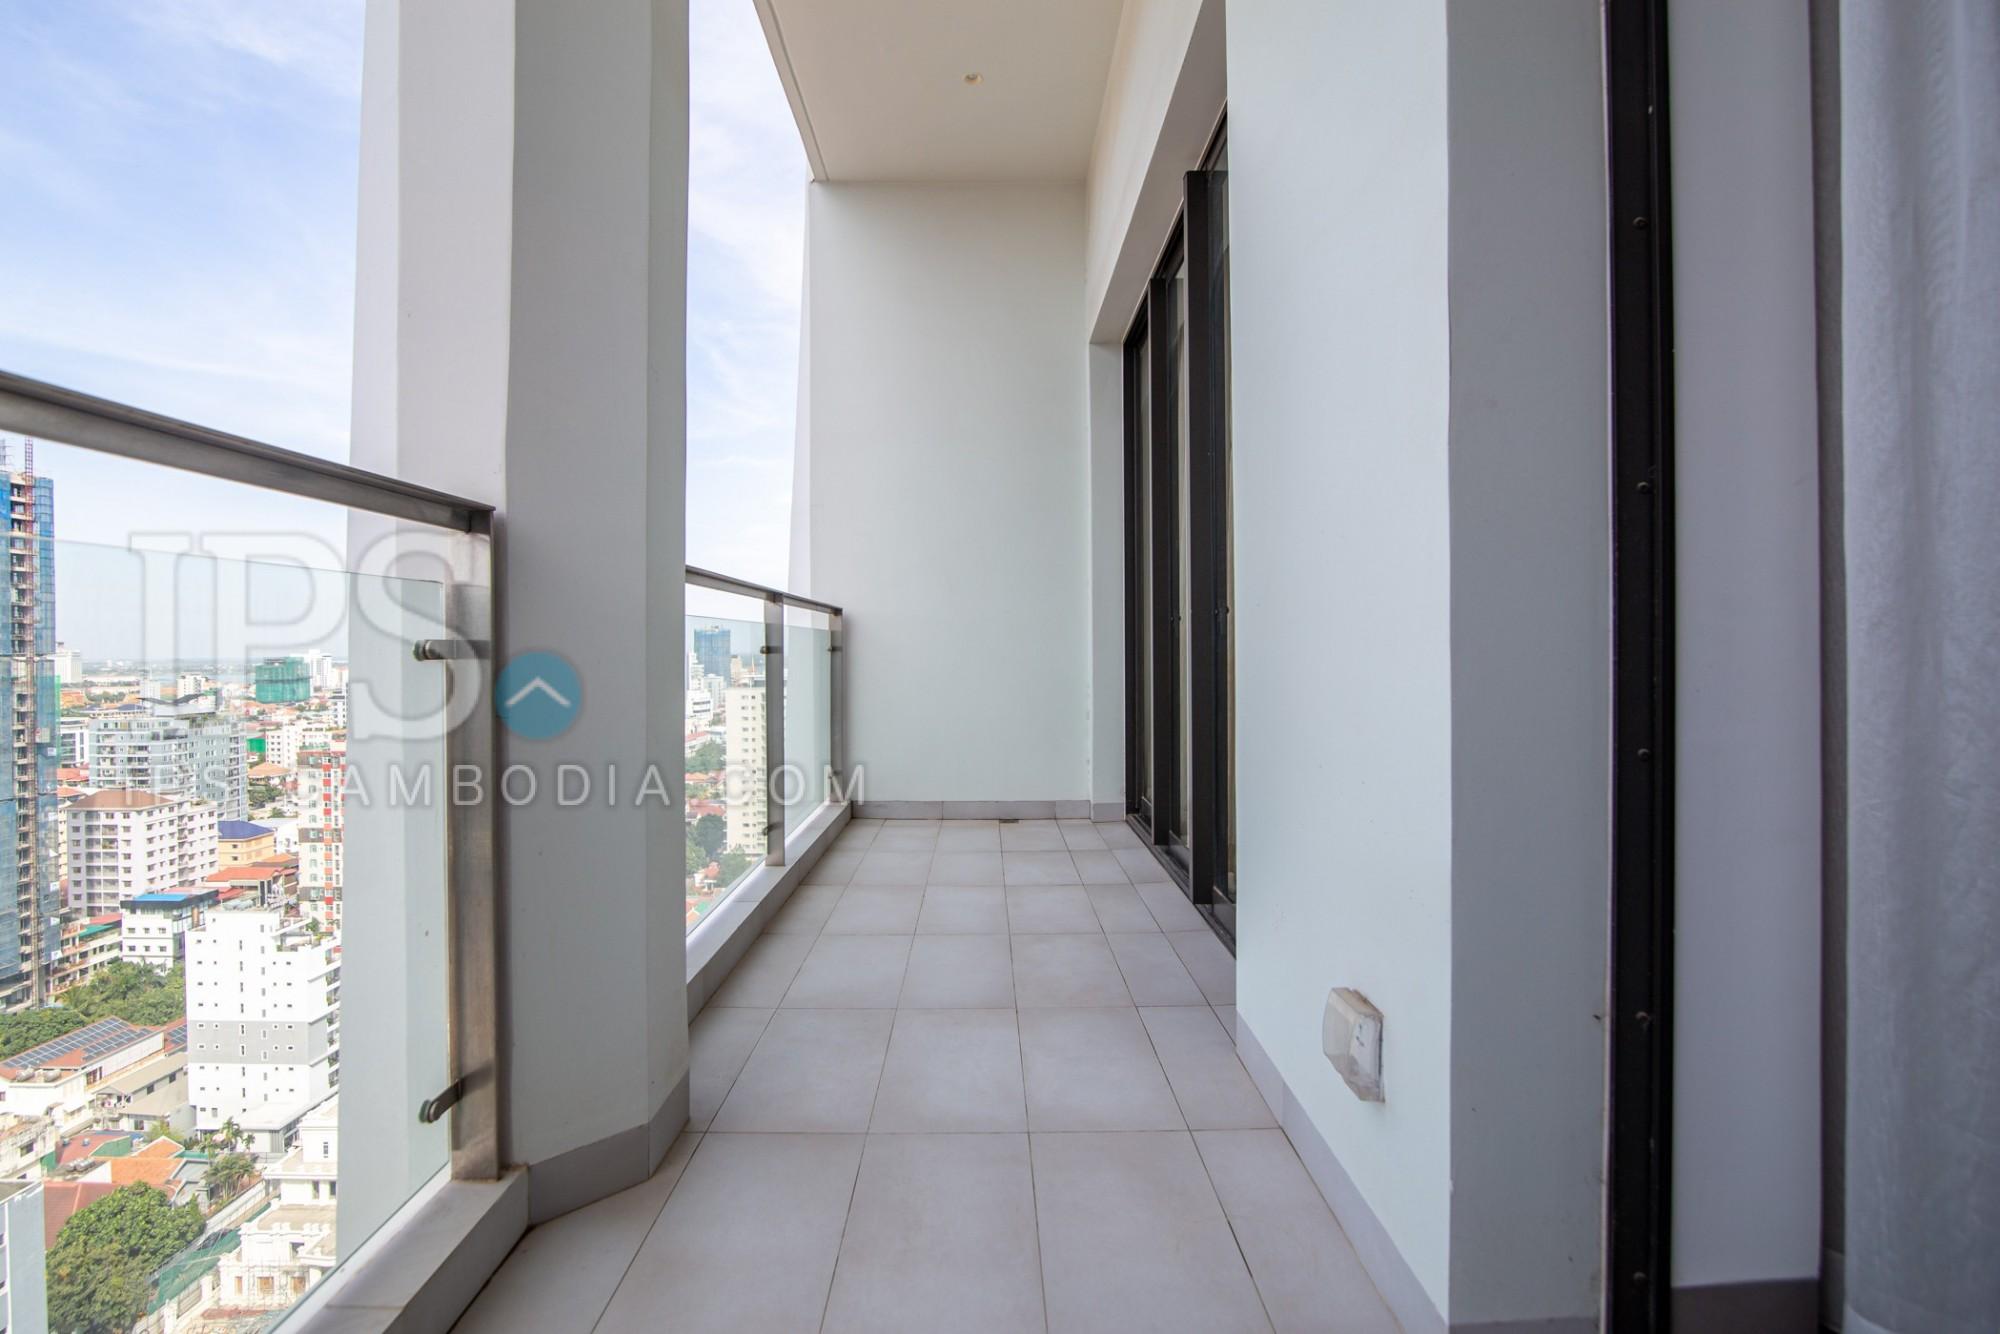 1 Bedroom Apartment For Rent - Embassy Central, BKK1, Phnom Penh